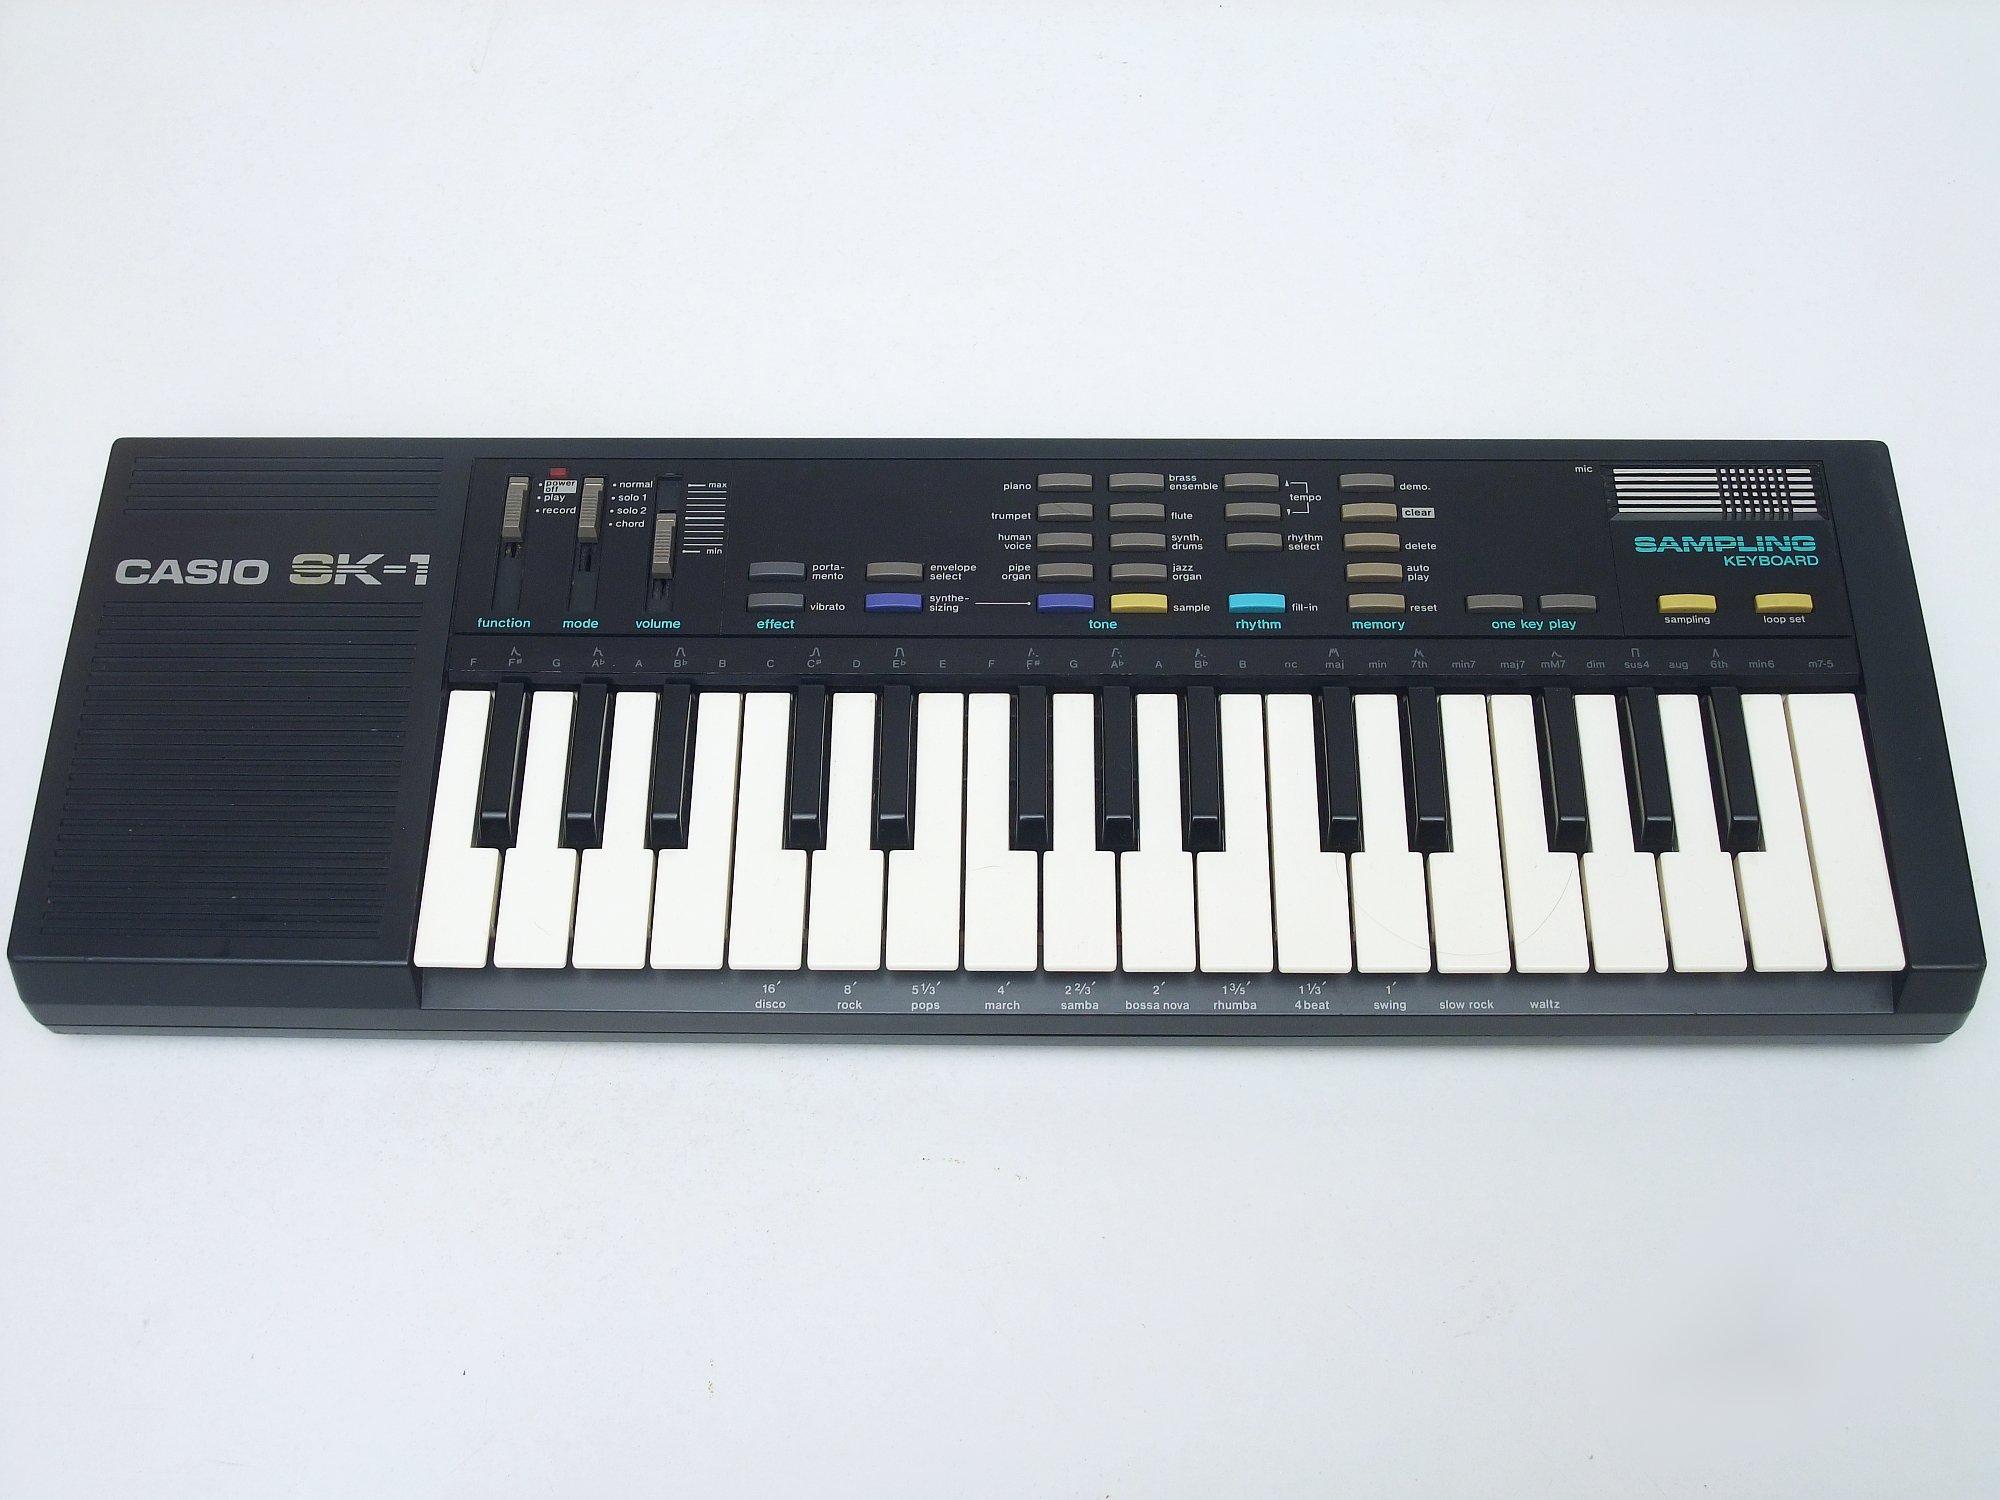 CASIO SK-1 Sampling Keyboard lo-fi sampler